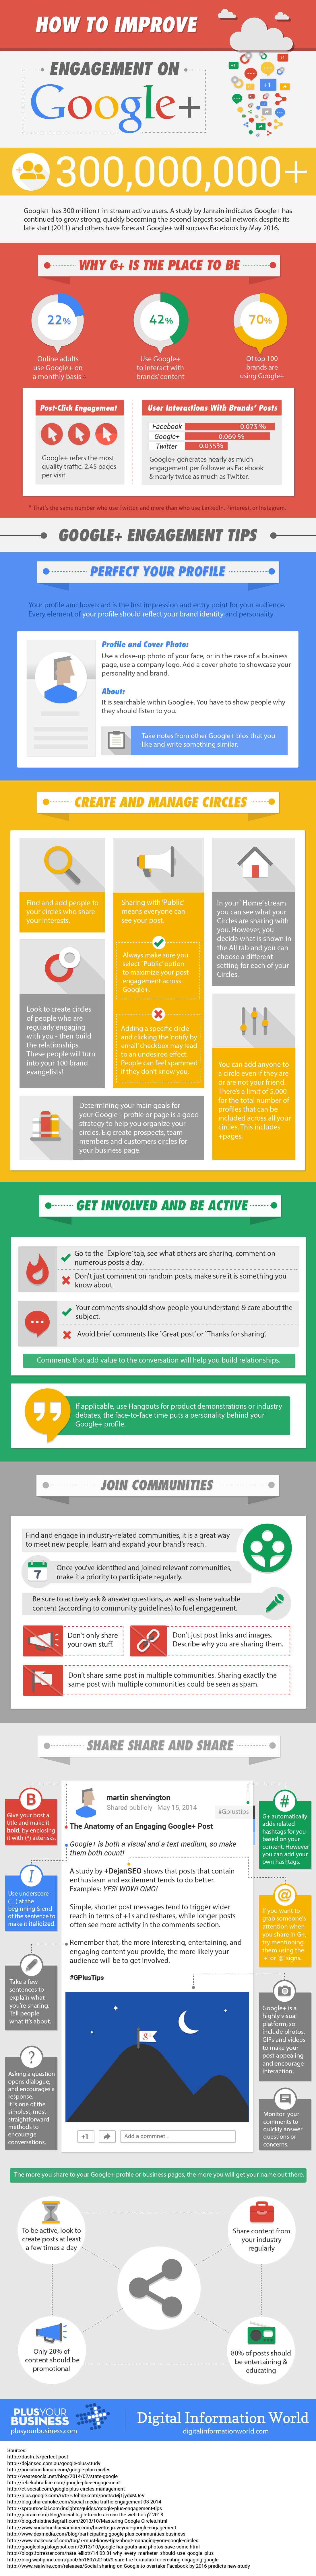 Improve Engagement for Google Plus Marketing